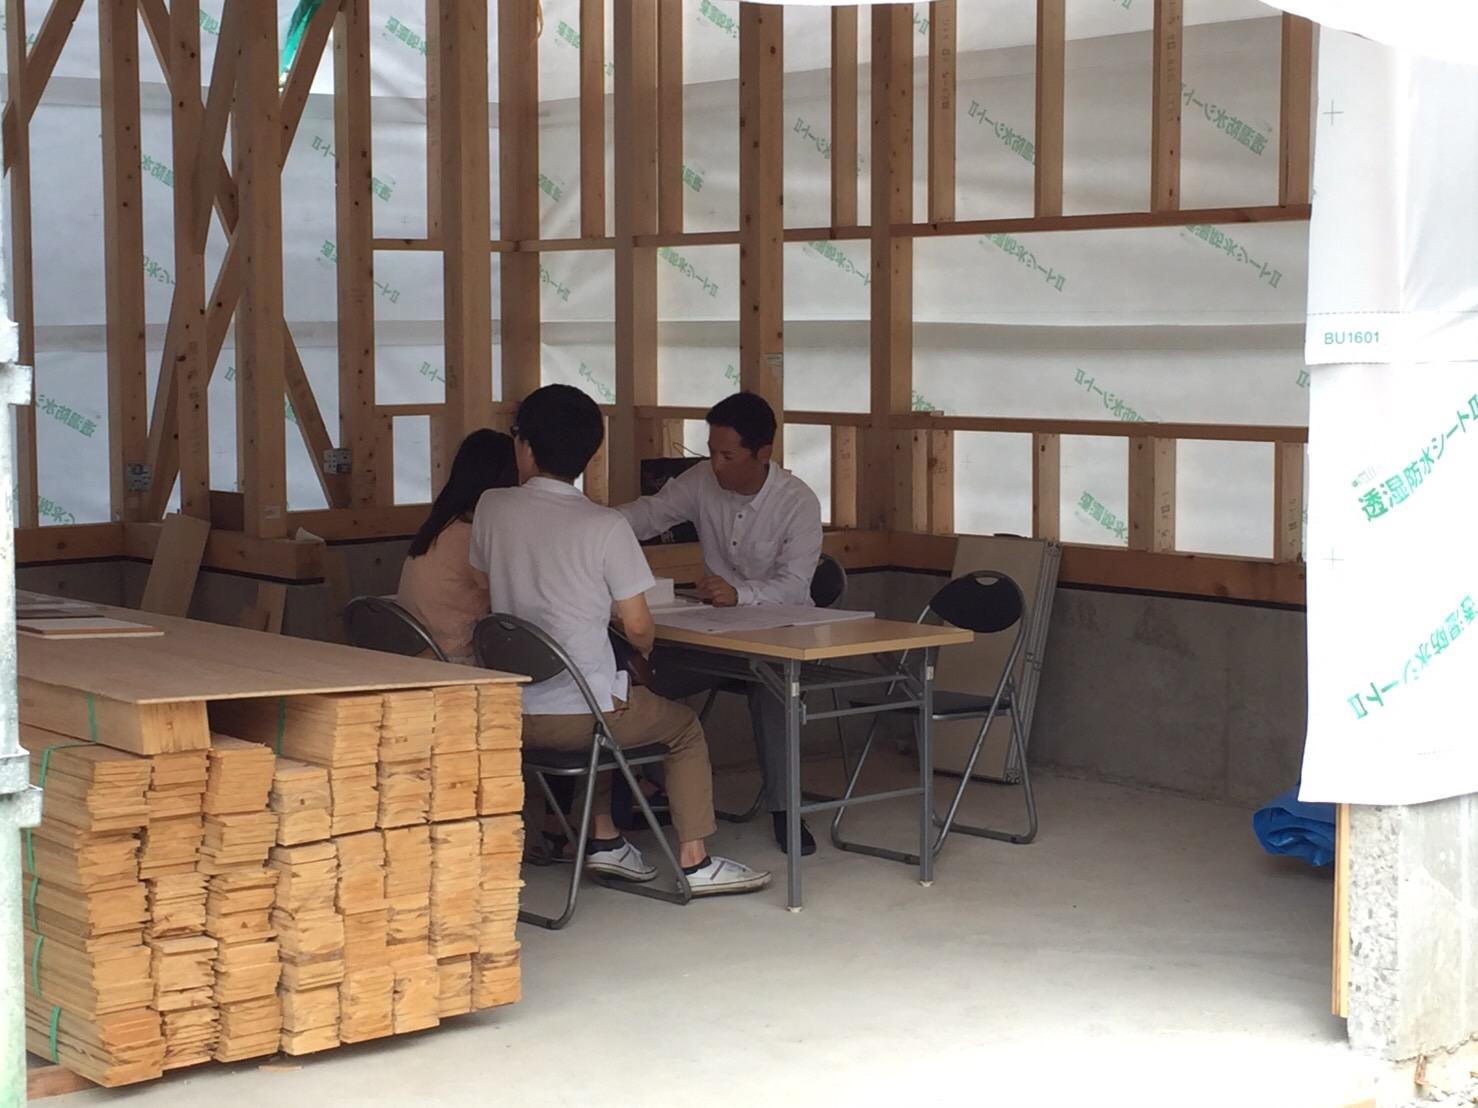 「HIKARI HOUSE」構造見学会 7/16・17_e0215179_10352072.jpg